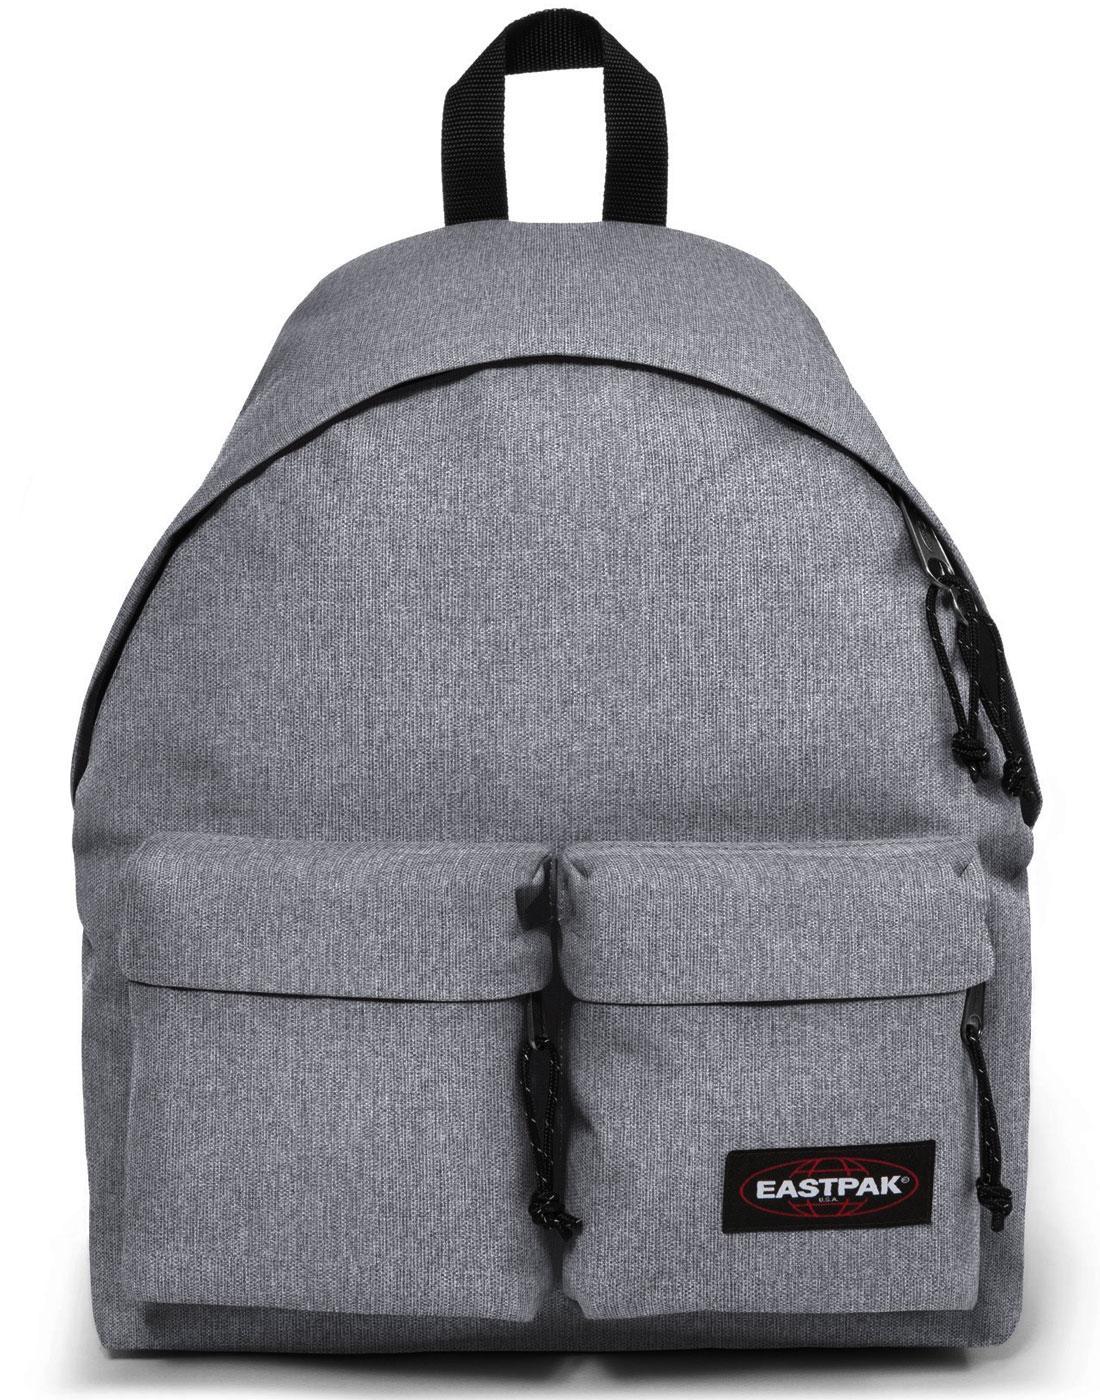 Padded Doublr EASTPAK Retro Backpack - Sunday Grey